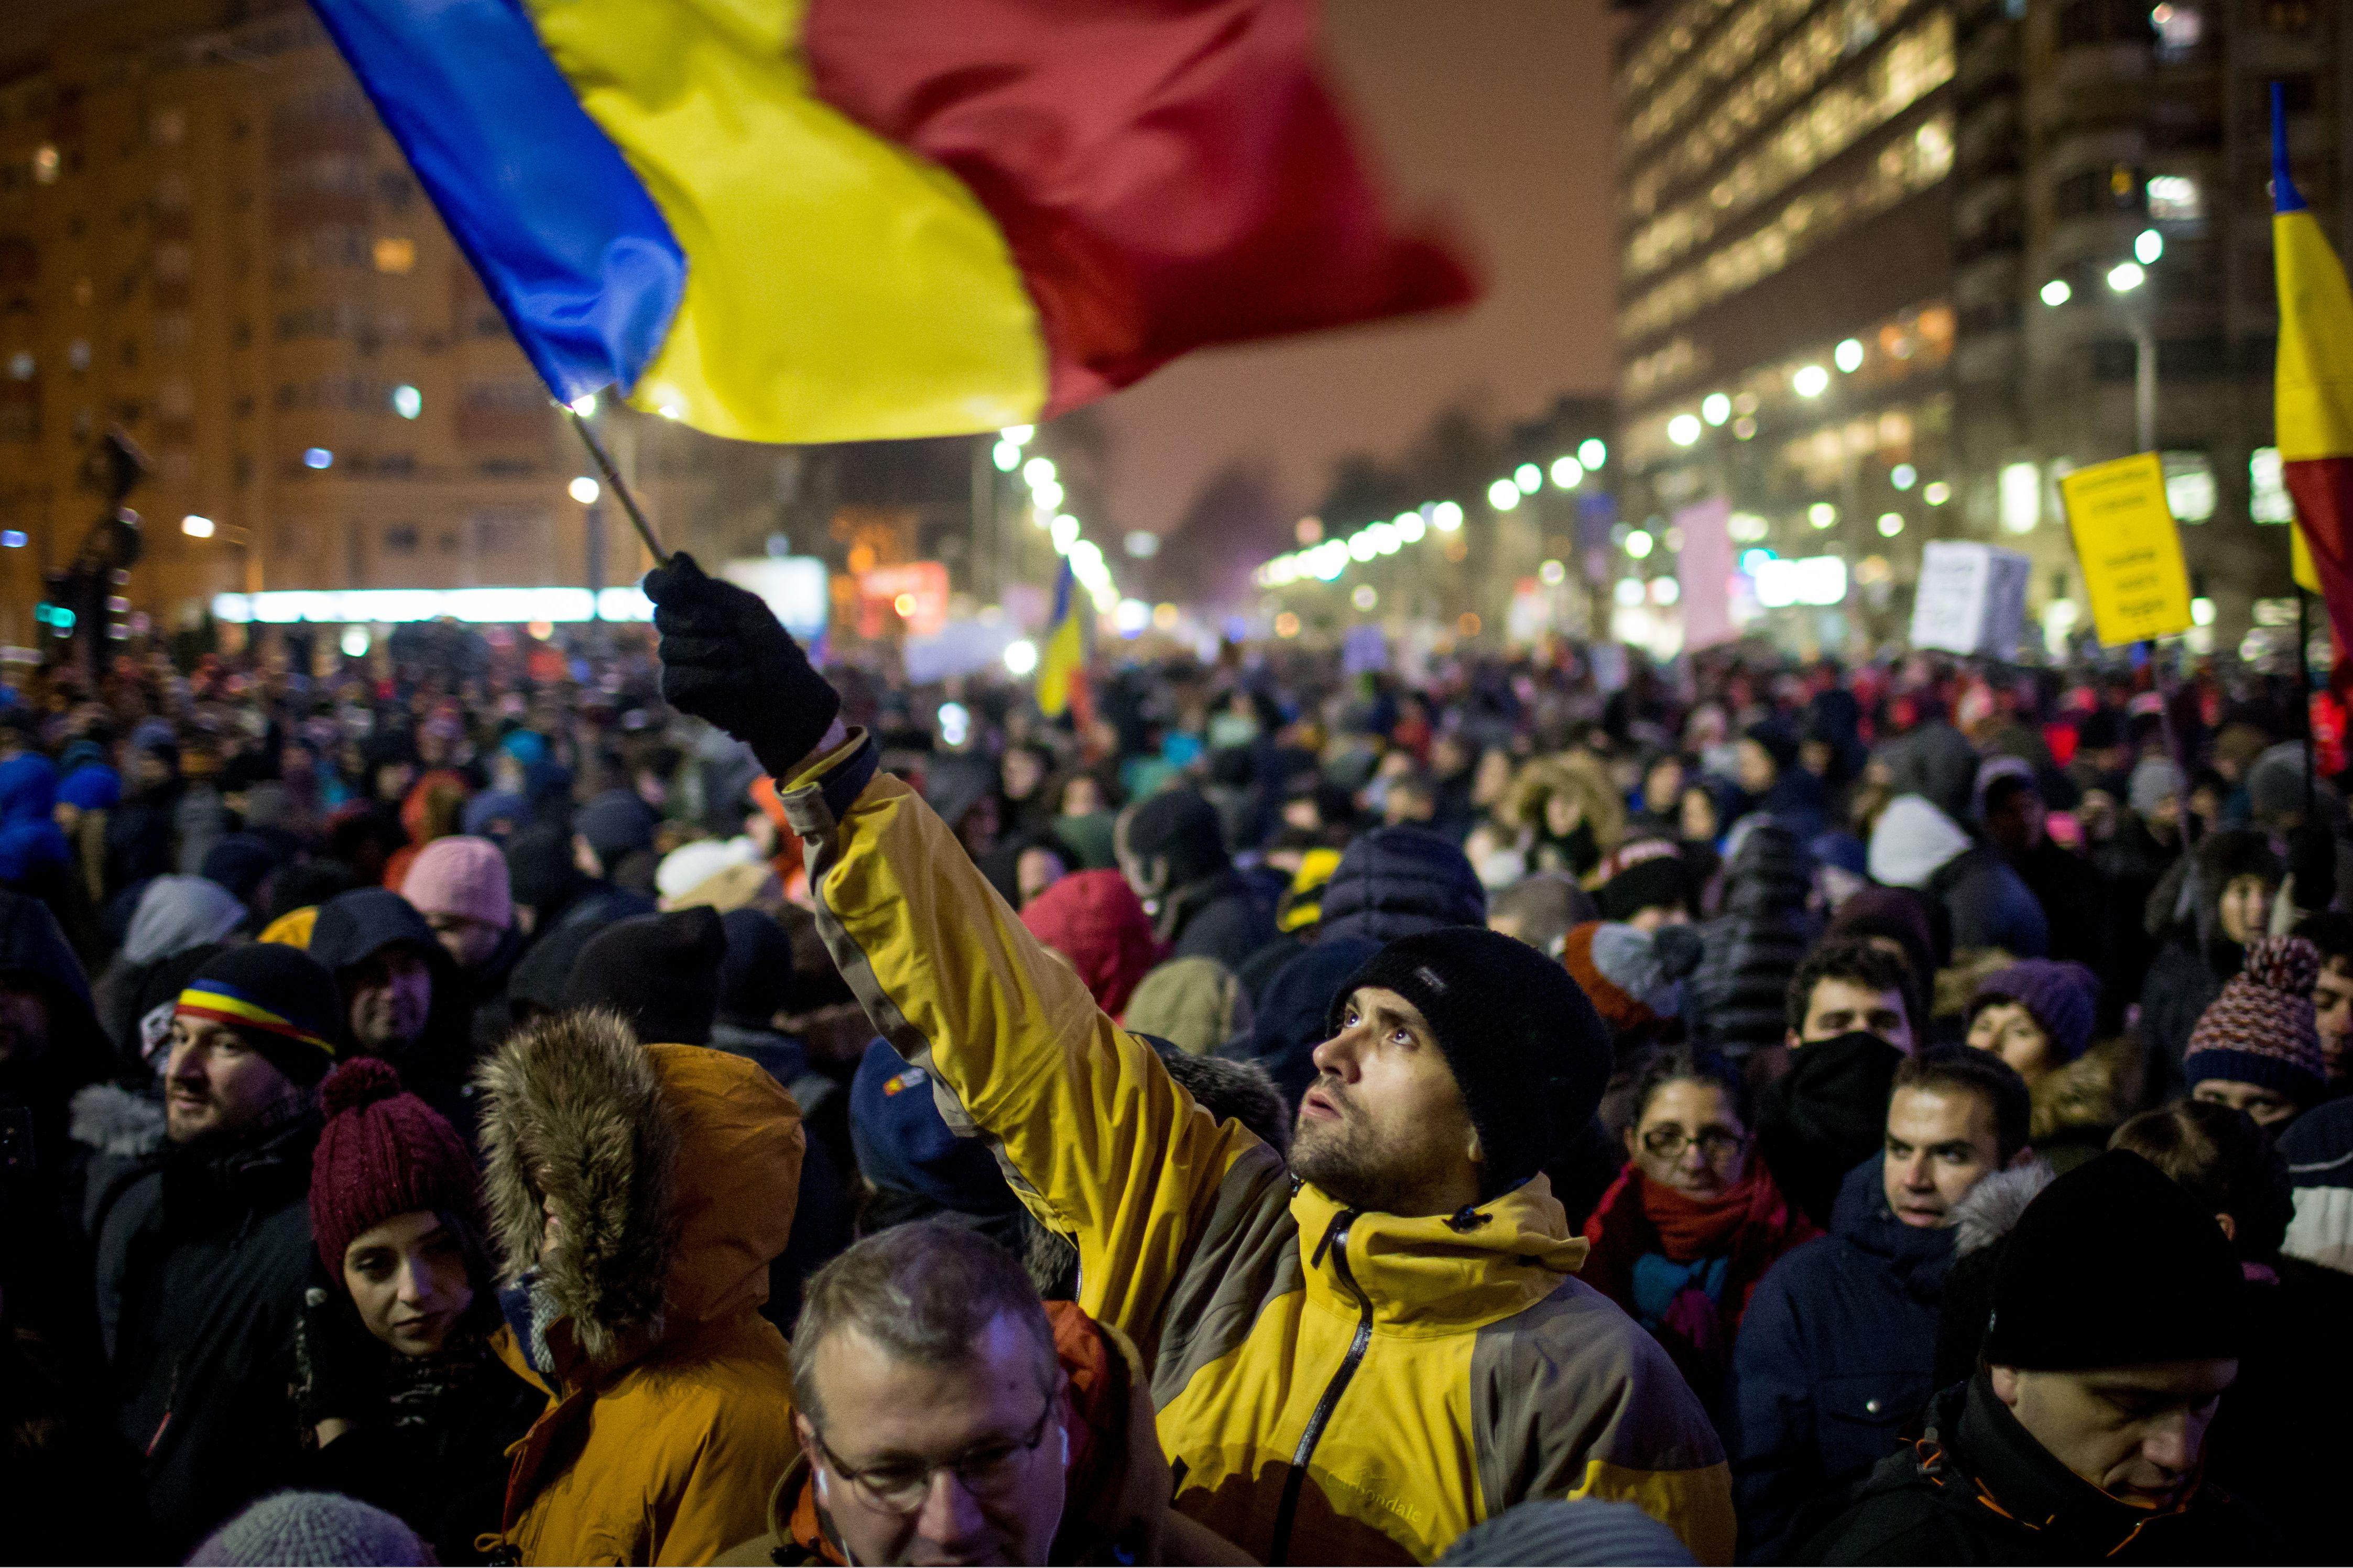 TOPSHOT-ROMANIA-POLITICS-CORRUPTION